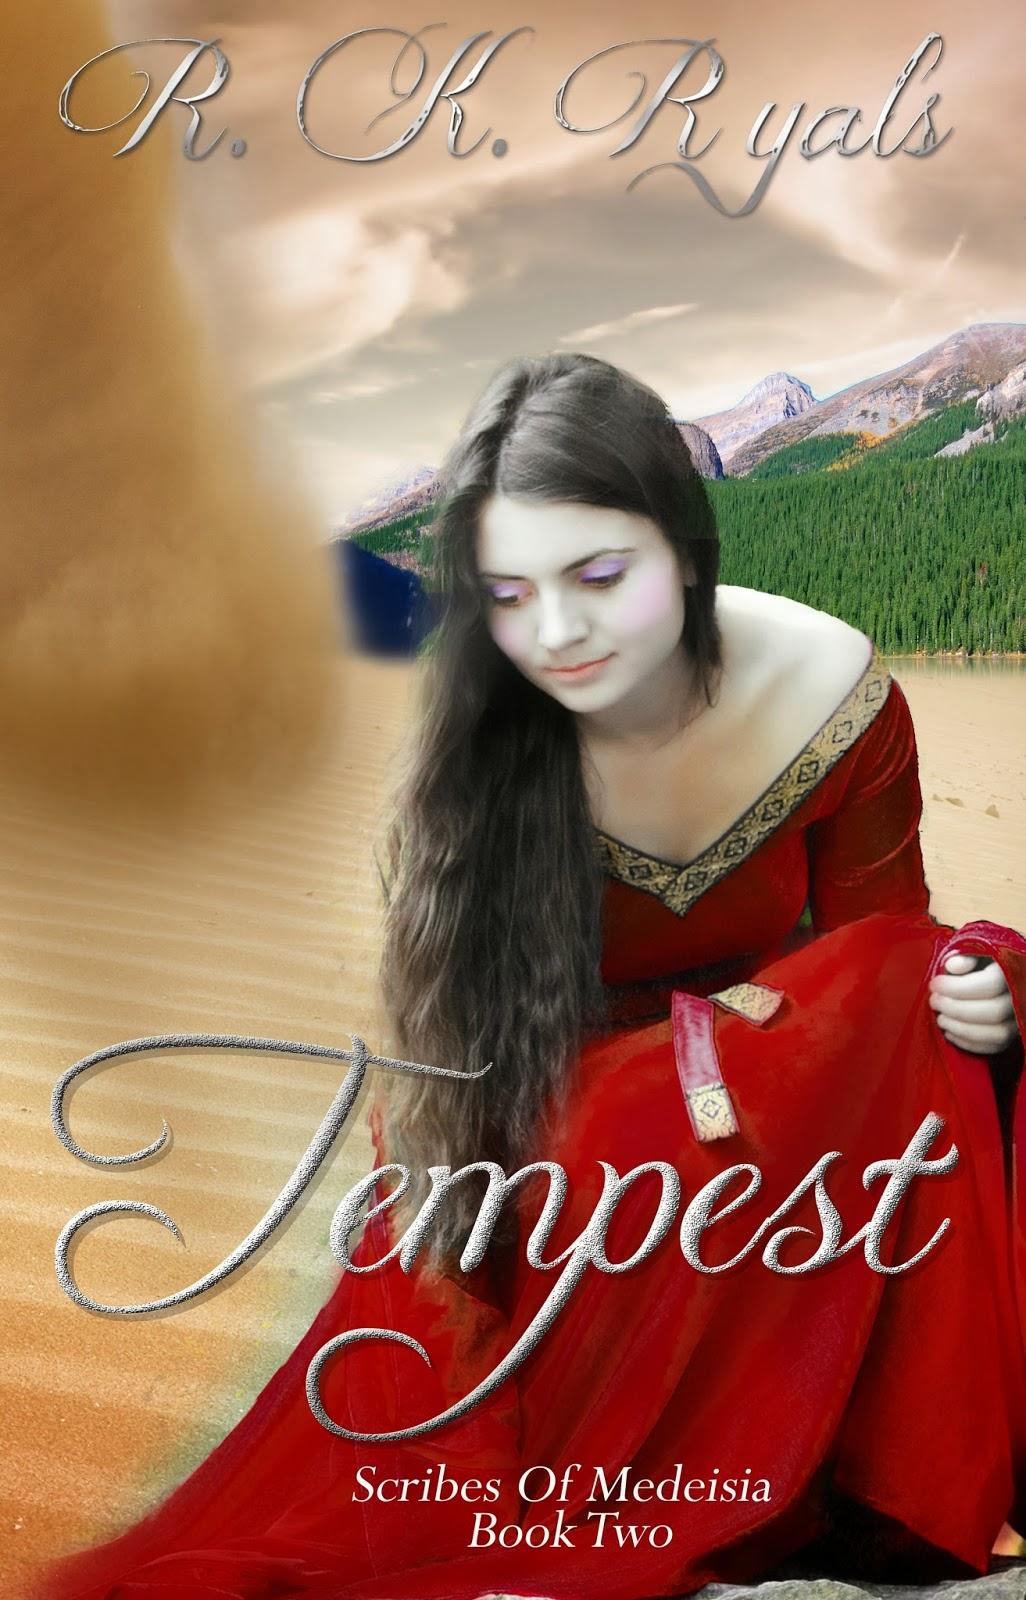 http://www.amazon.com/Tempest-Scribes-Medeisia-R-K-Ryals-ebook/dp/B00CQCQWJ8/ref=sr_1_7?s=digital-text&ie=UTF8&qid=1391405369&sr=1-7&keywords=tempest